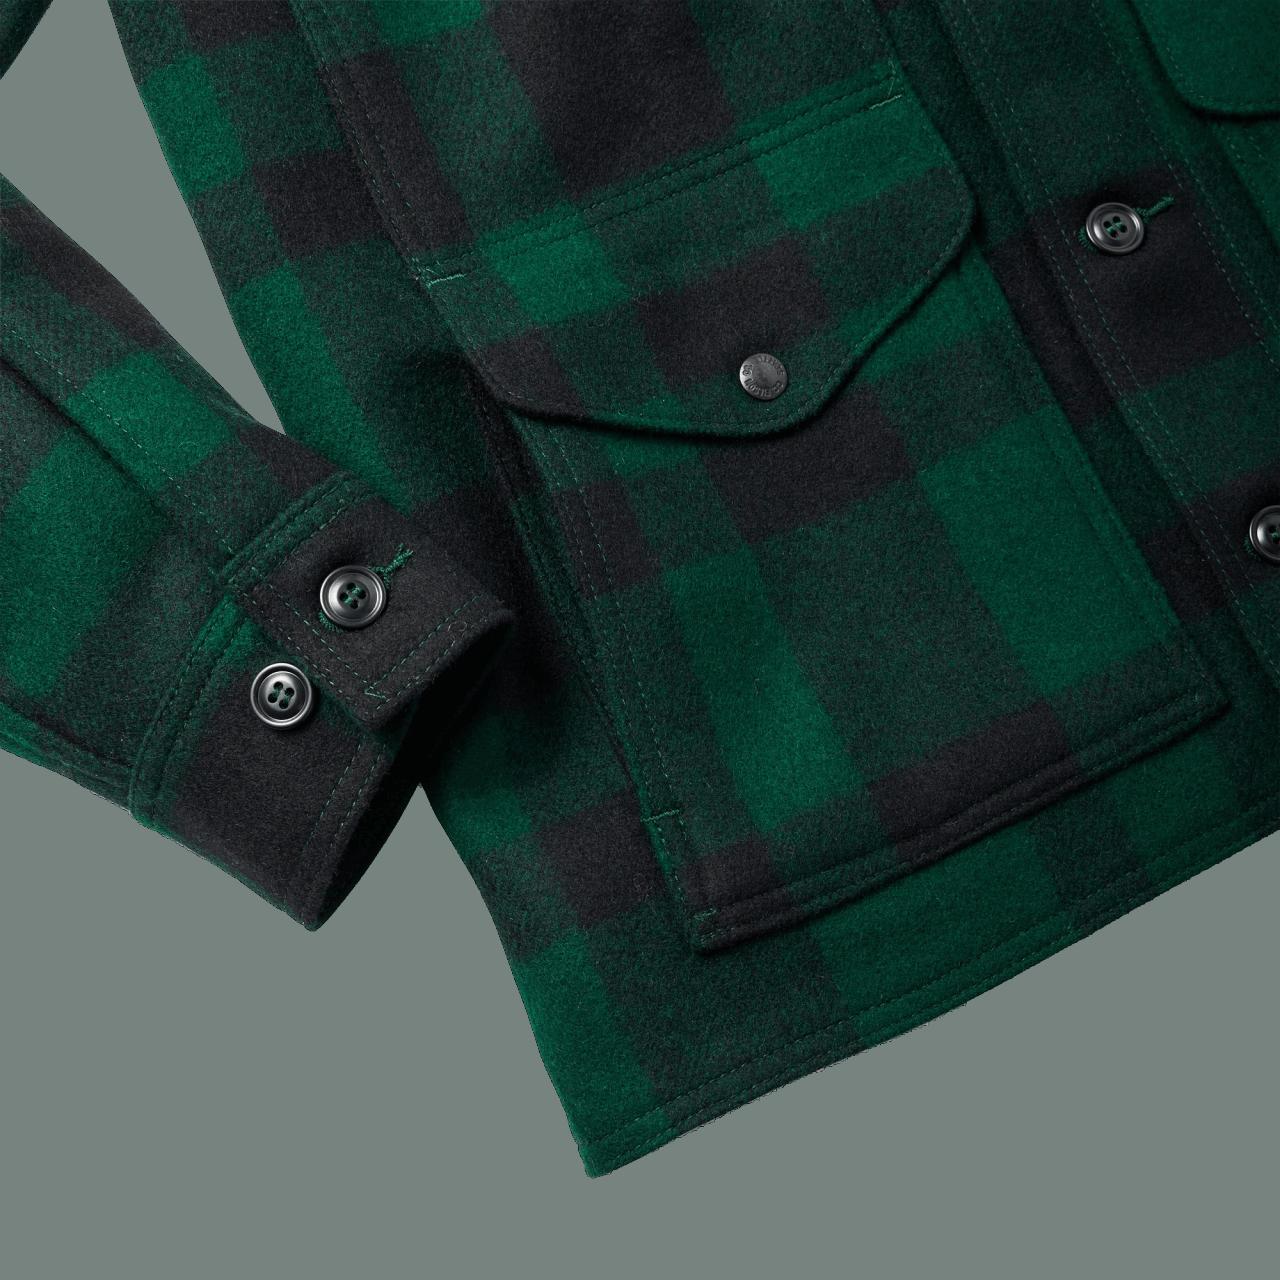 Filson Mackinaw Cruiser - Green/Black